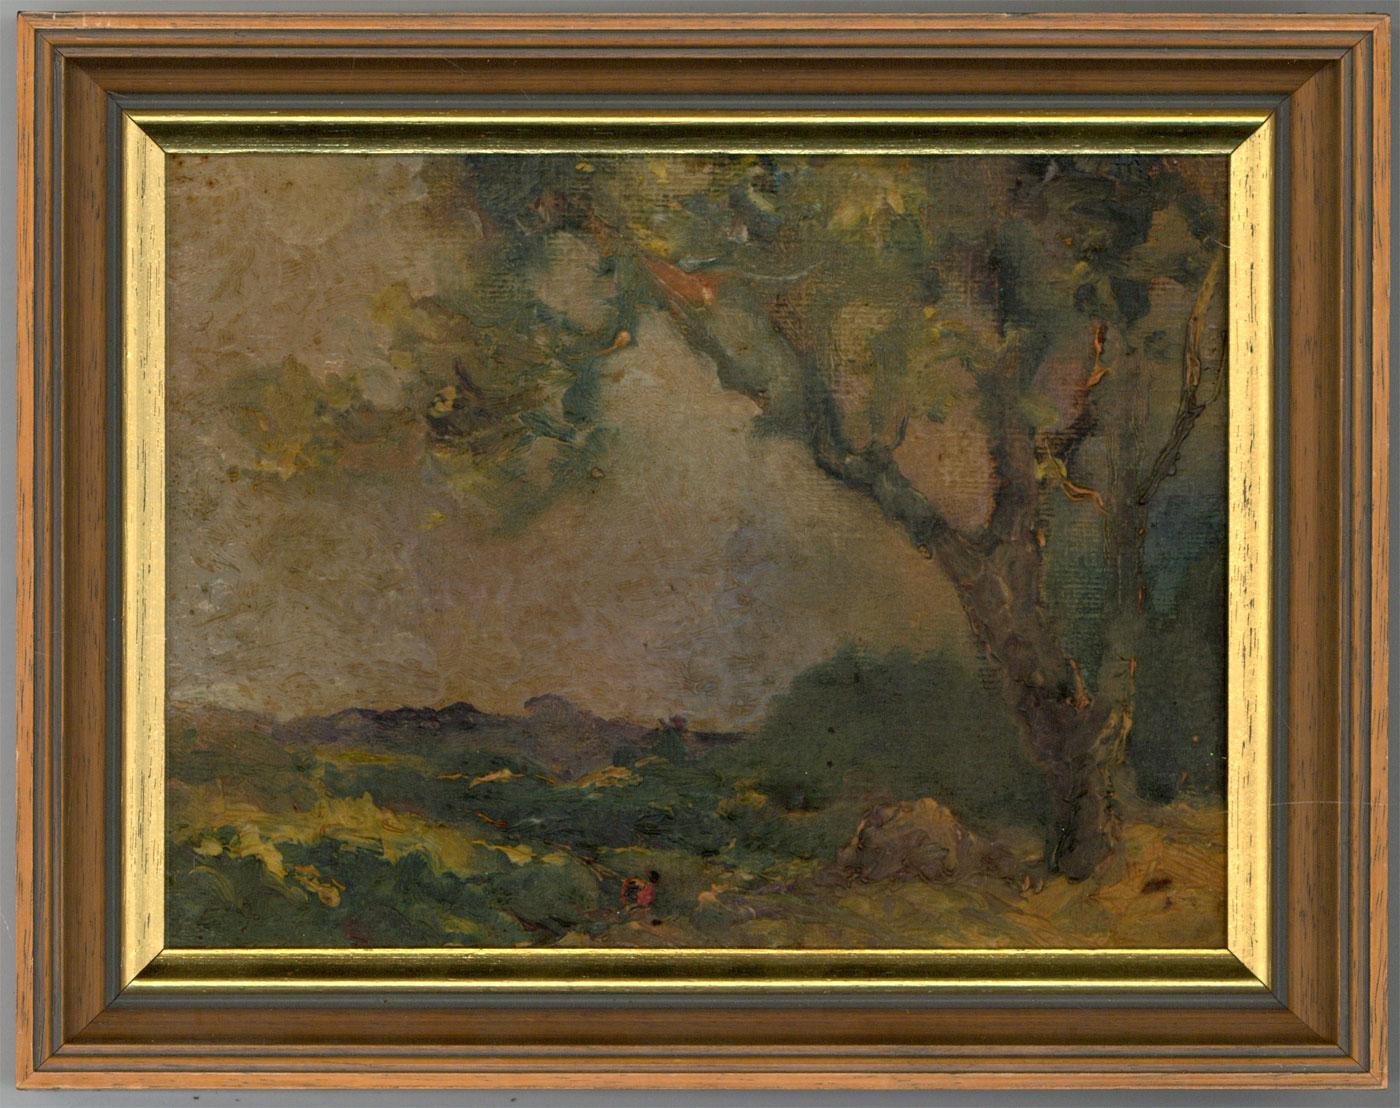 Graham Hyde - Impressionist Style 20th Century Oil, Woodland Landscape